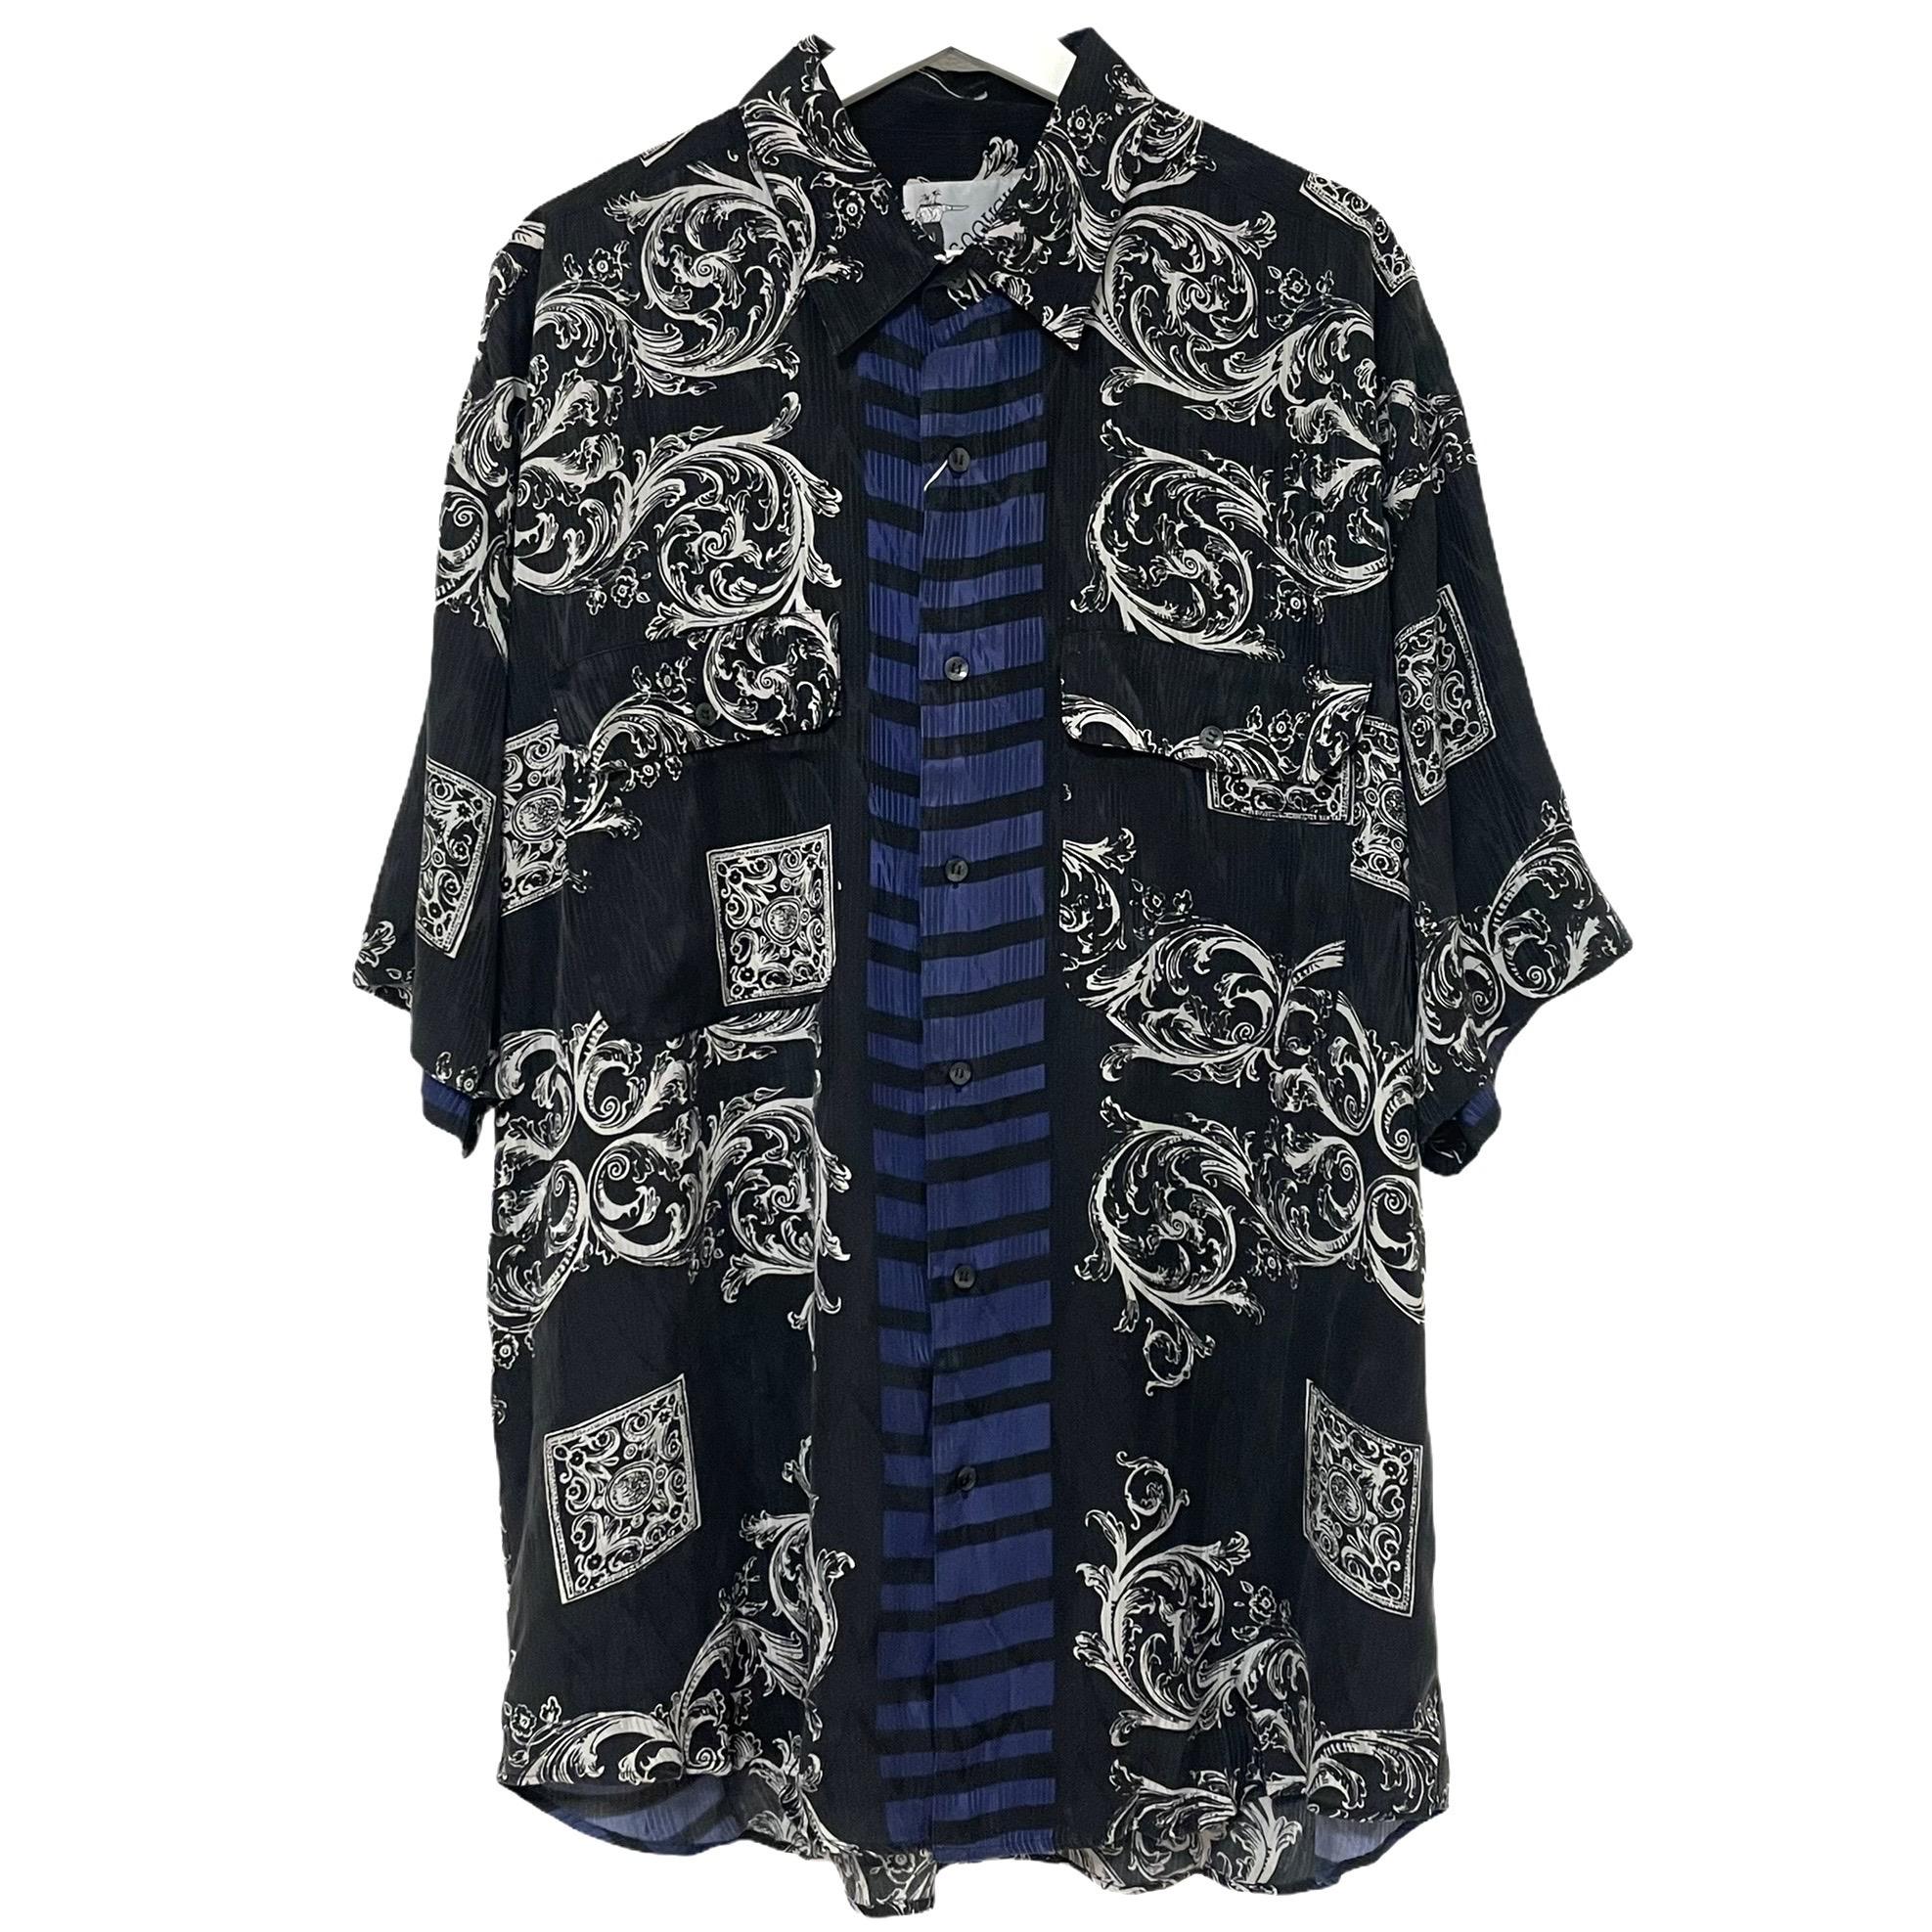 Dead Stock 90's GOOUCH Silk Shirt PLUM Short シャツ 時間指定不可 柄 注文後の変更キャンセル返品 デッドストック Sleeve 半袖 シルク グーチ